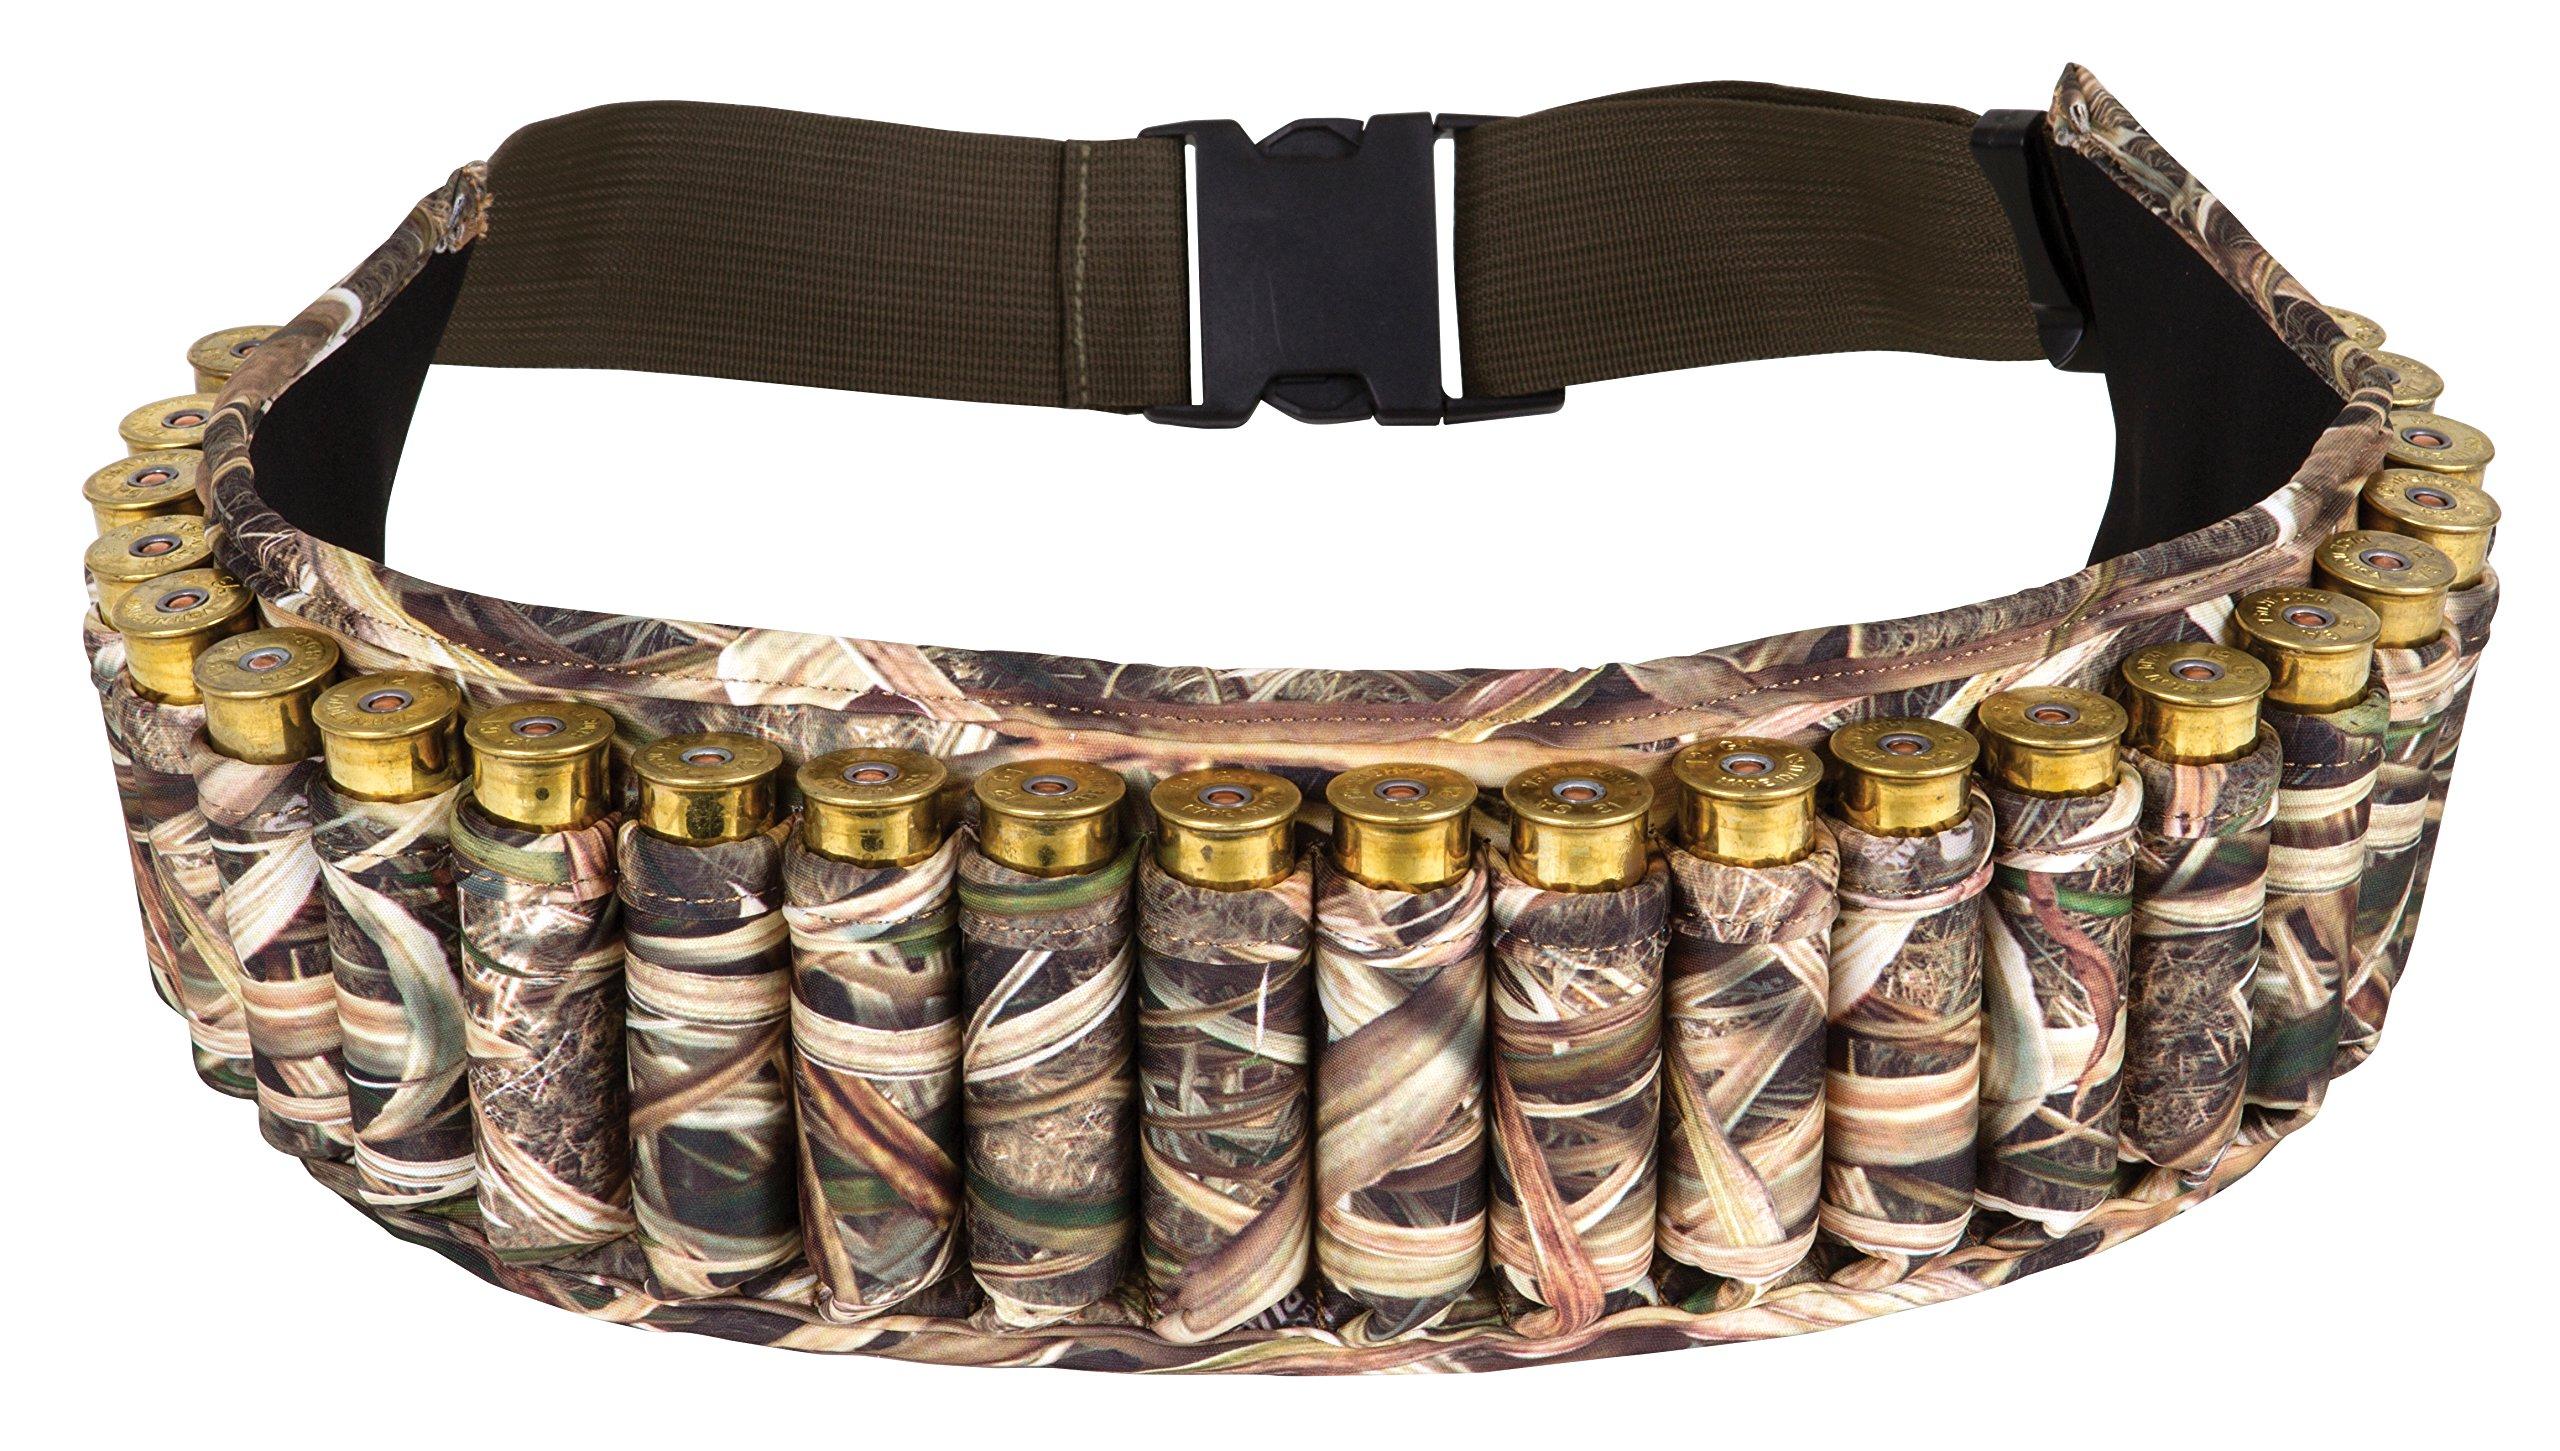 Flambeau Outdoors Neoprene Shotshell Belt - (25) Rounds, One Size by Flambeau Outdoors (Image #1)